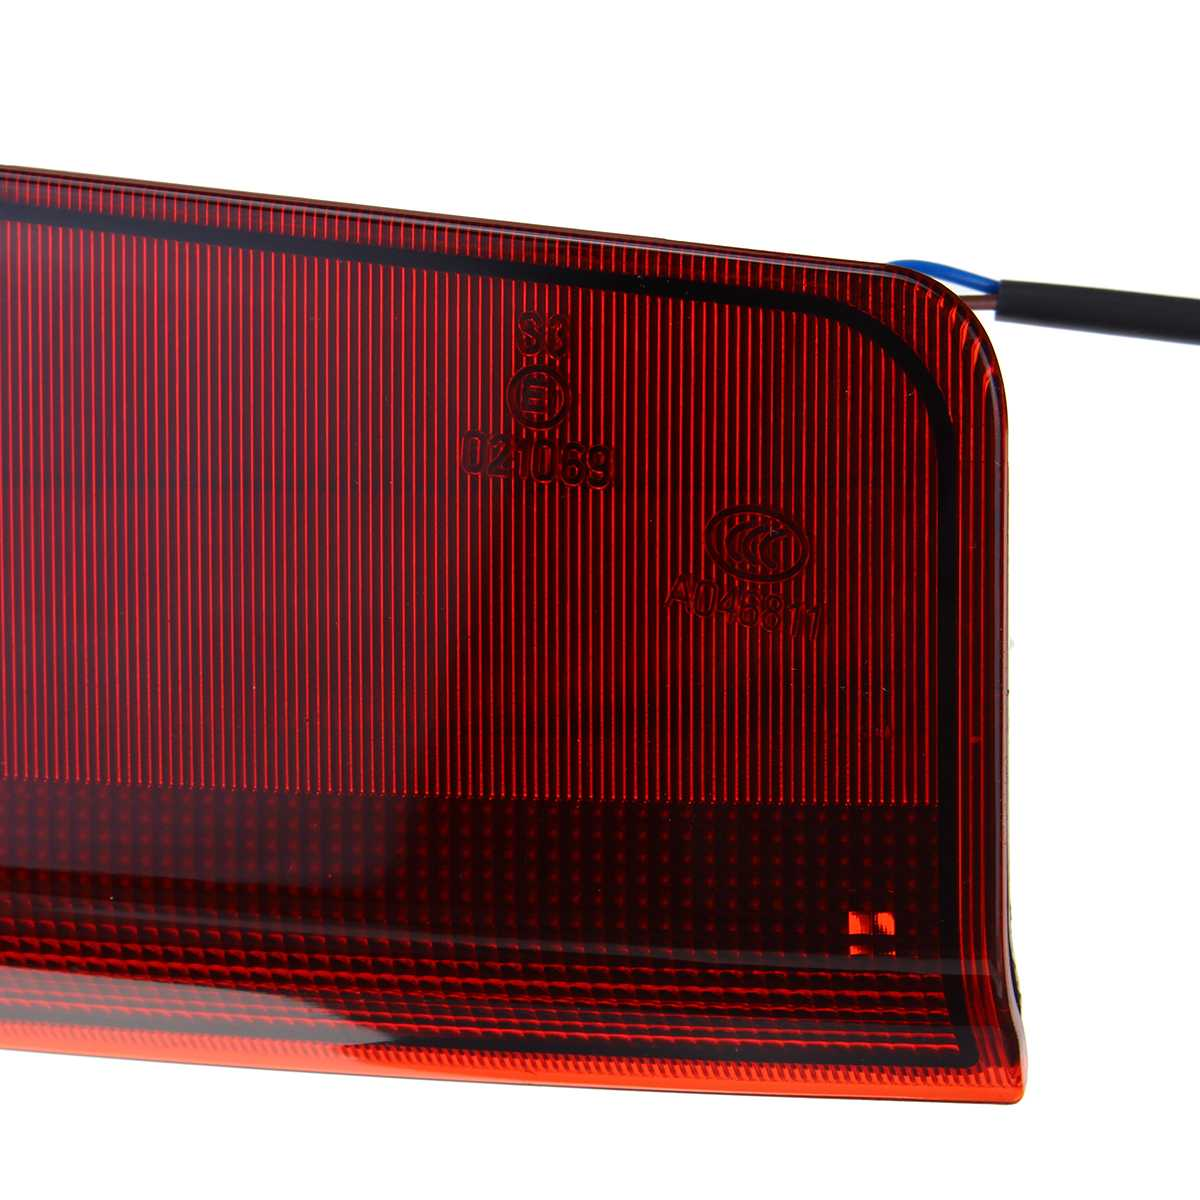 5x Rear Light Tail Back Light Lamp Mounting Clips Grommets For Range Land Rover